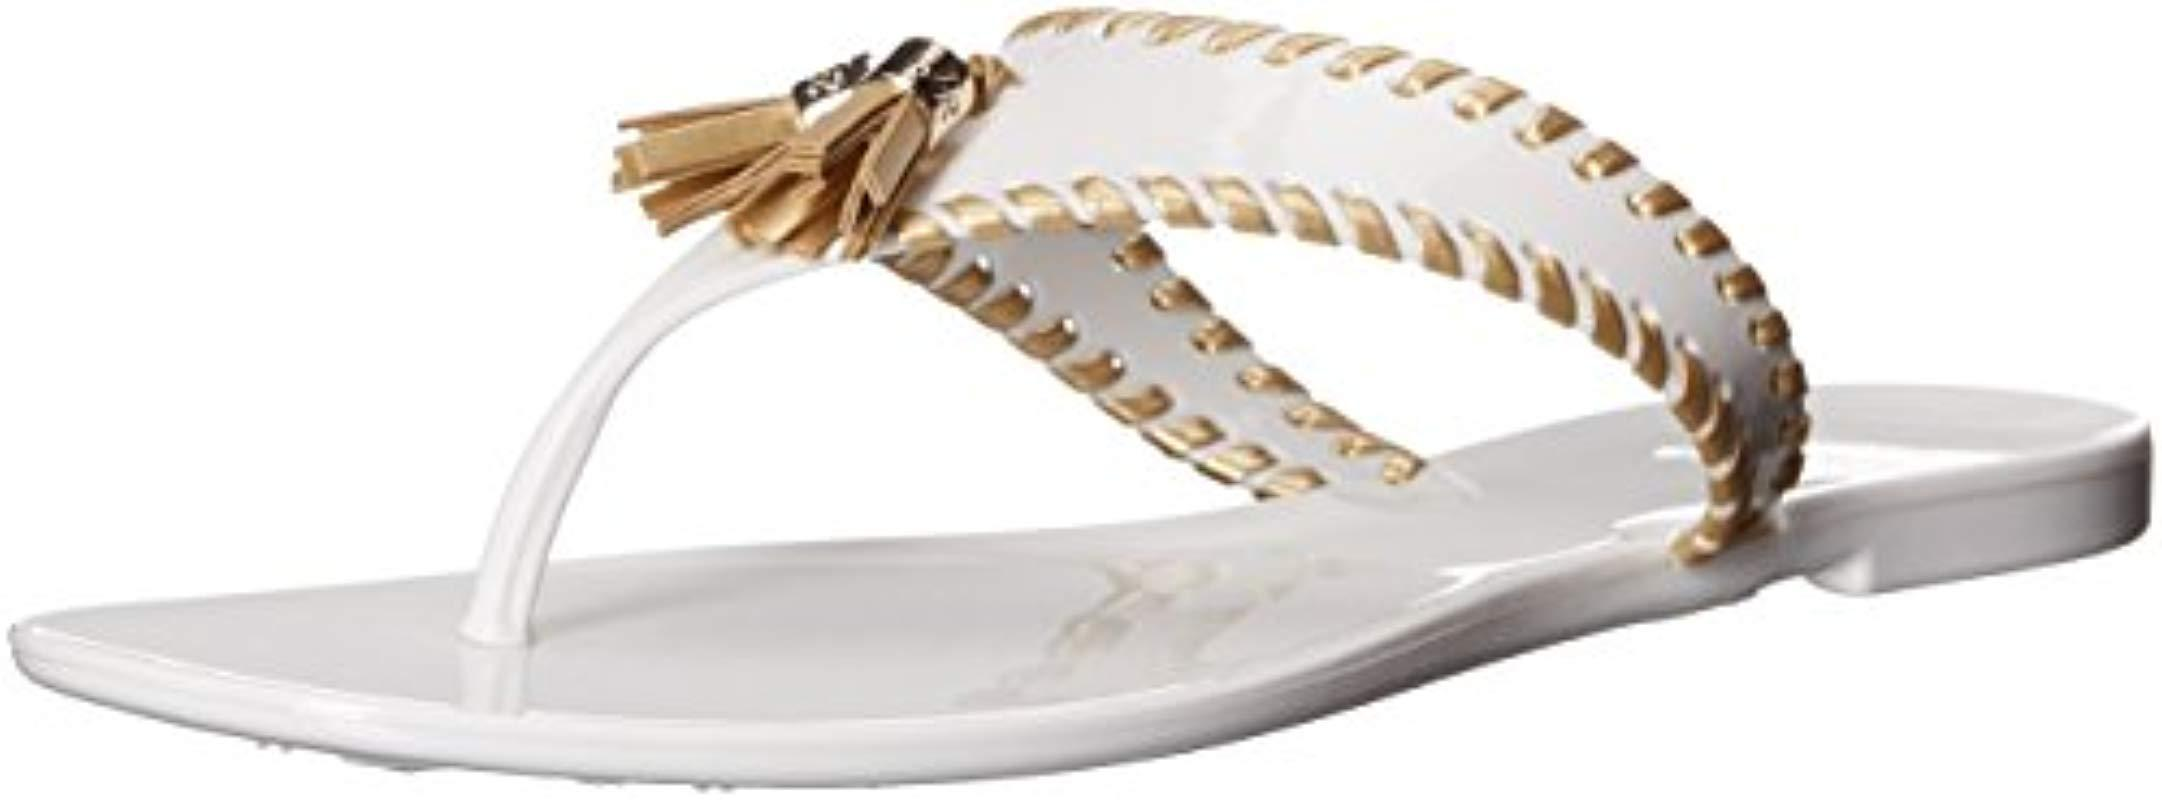 17c6220b8114 Lyst - Jack Rogers Alana Jelly Flip Flop in White